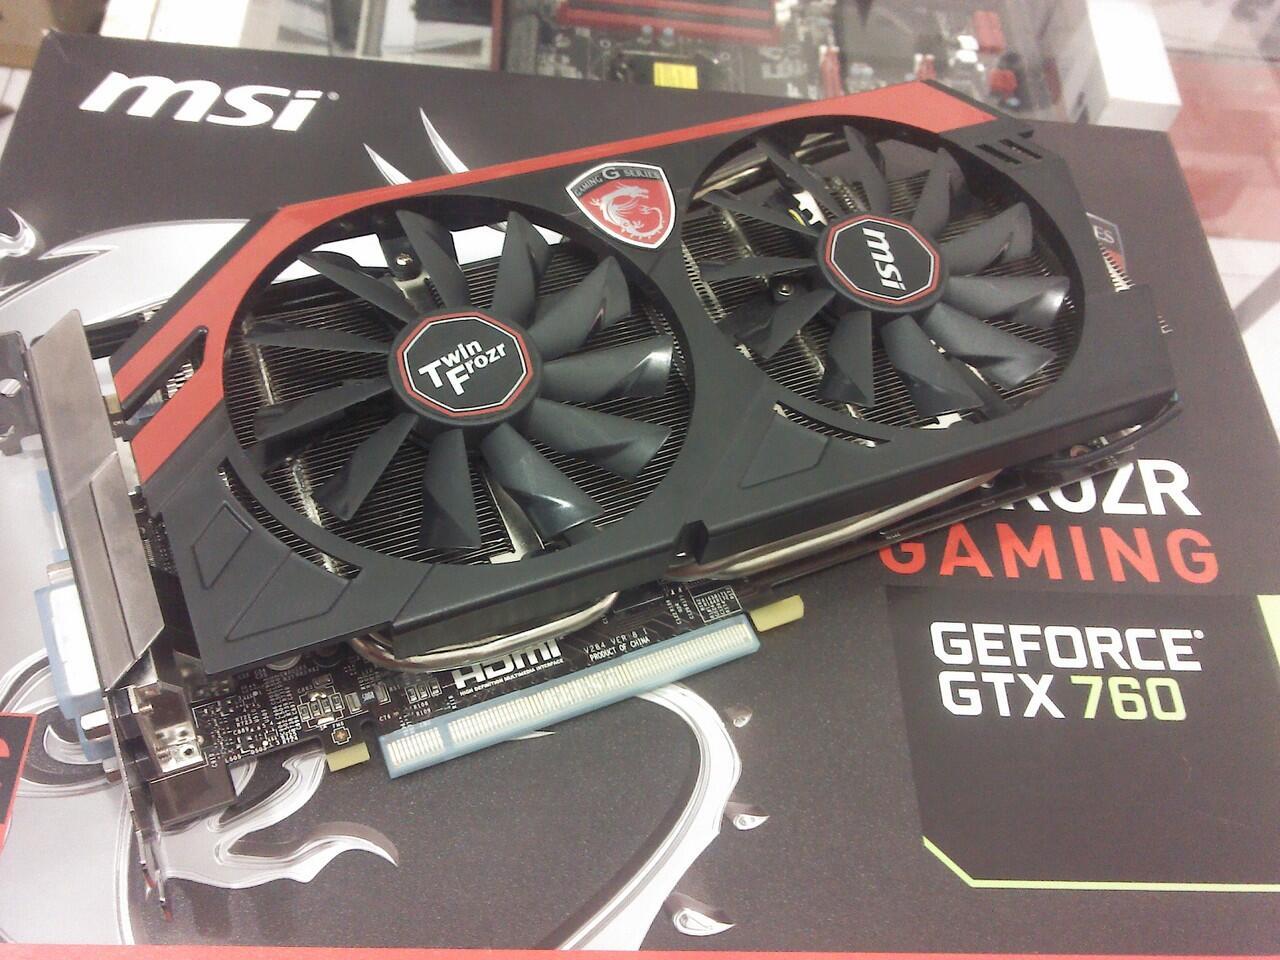 jual vga Card MSI GTX 760 TWIN FRORZ 2GB/DDR5 harga jos gandos - MALANG